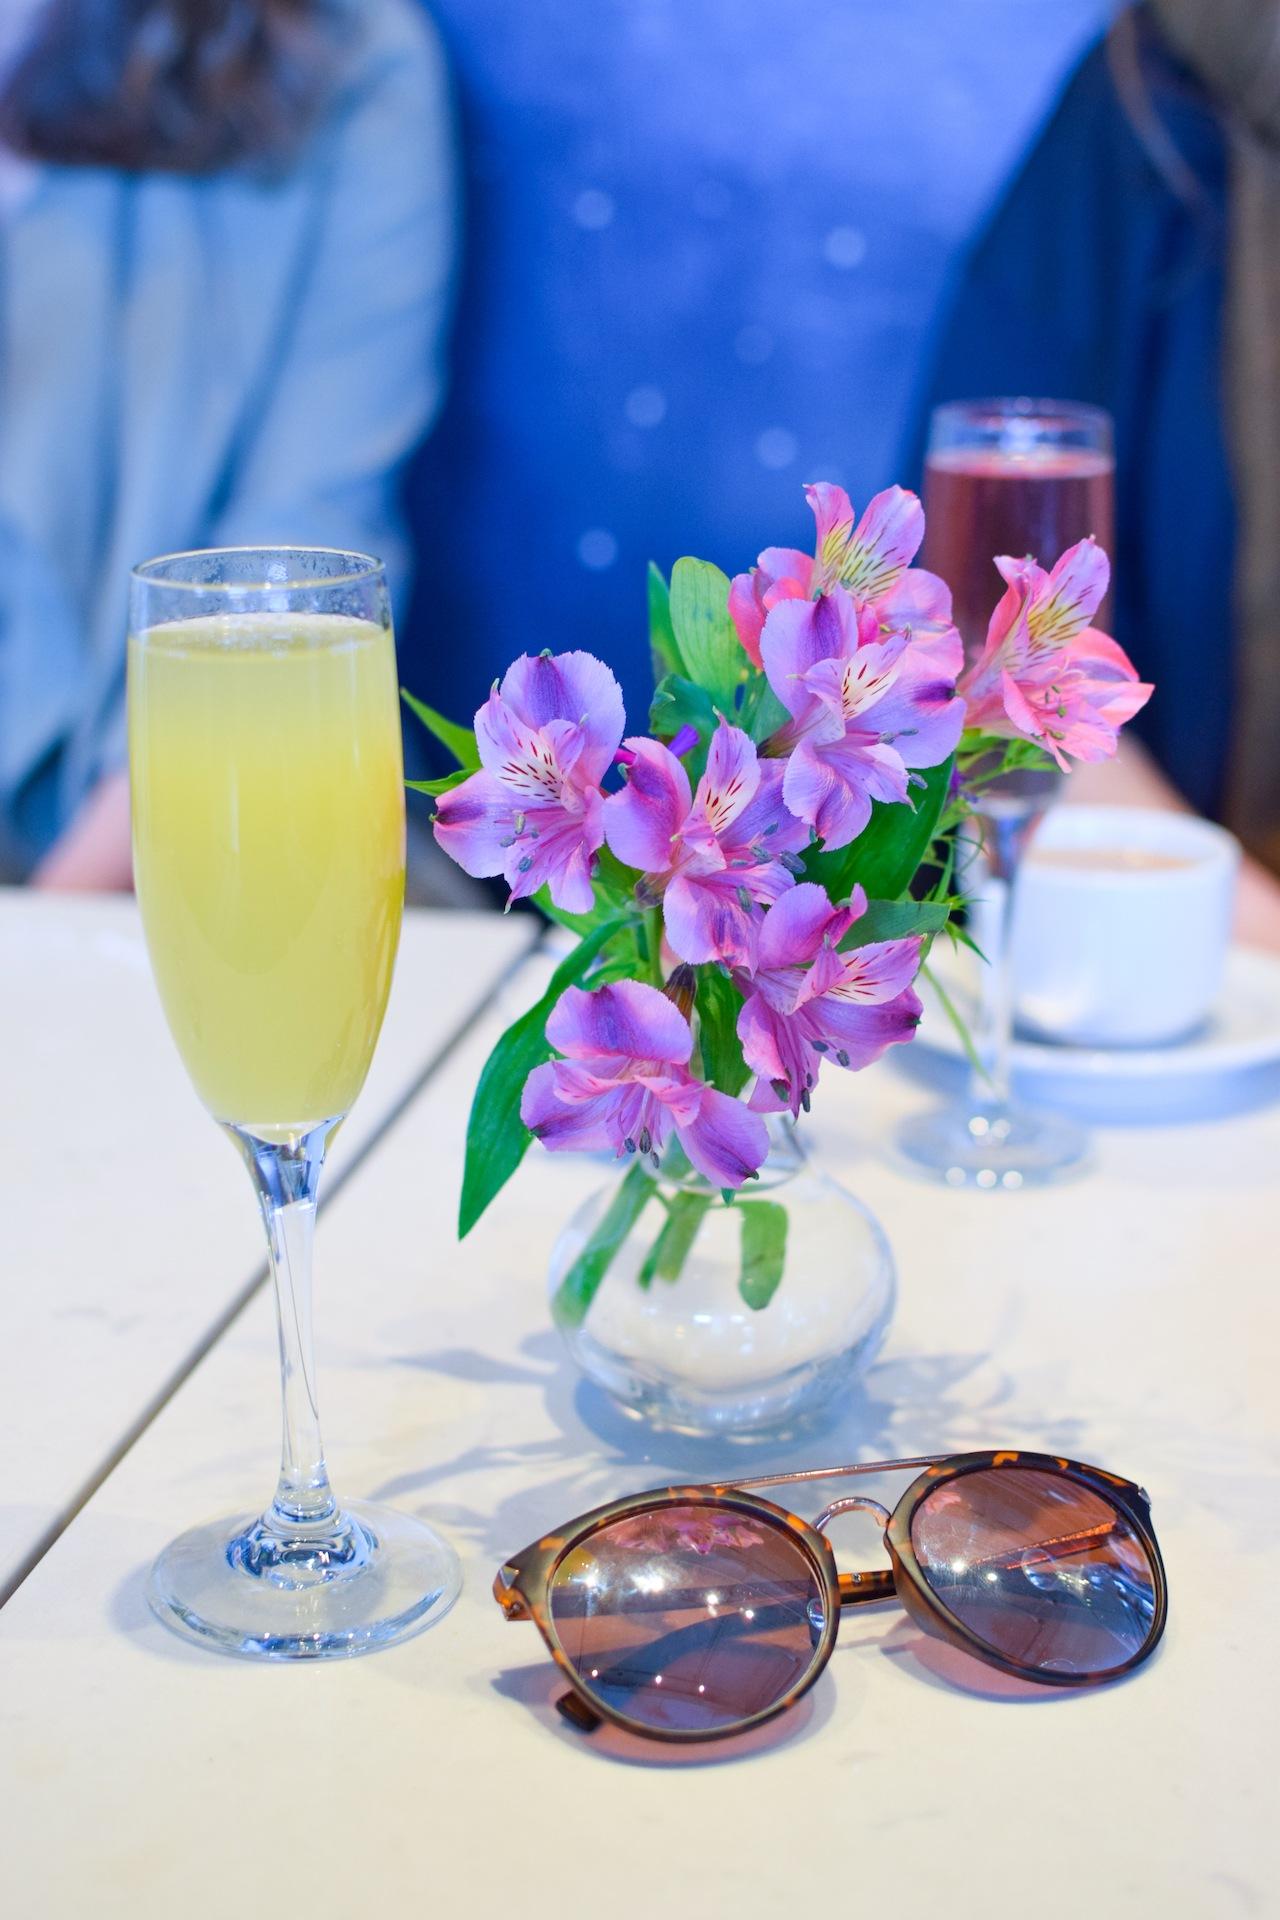 malmaison georgetown restaurant review